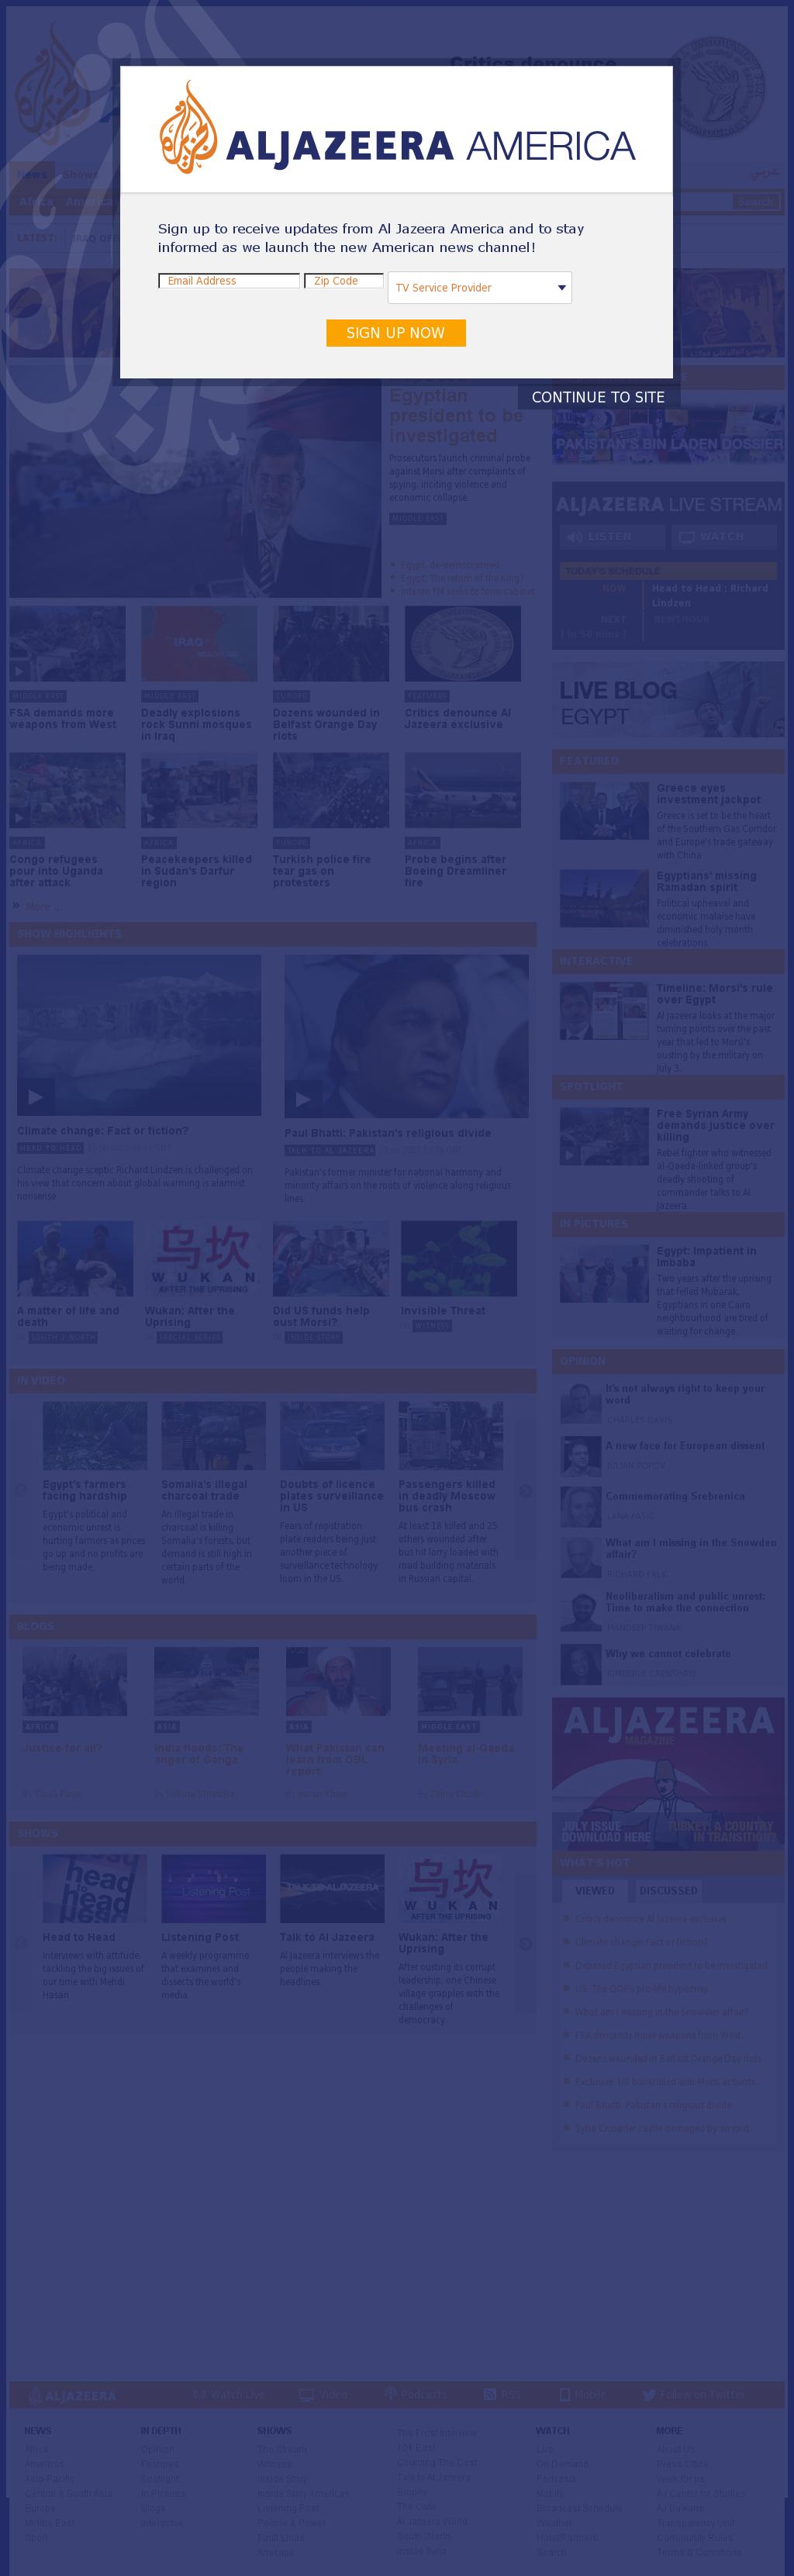 Al Jazeera (English) at Sunday July 14, 2013, 1:09 a.m. UTC